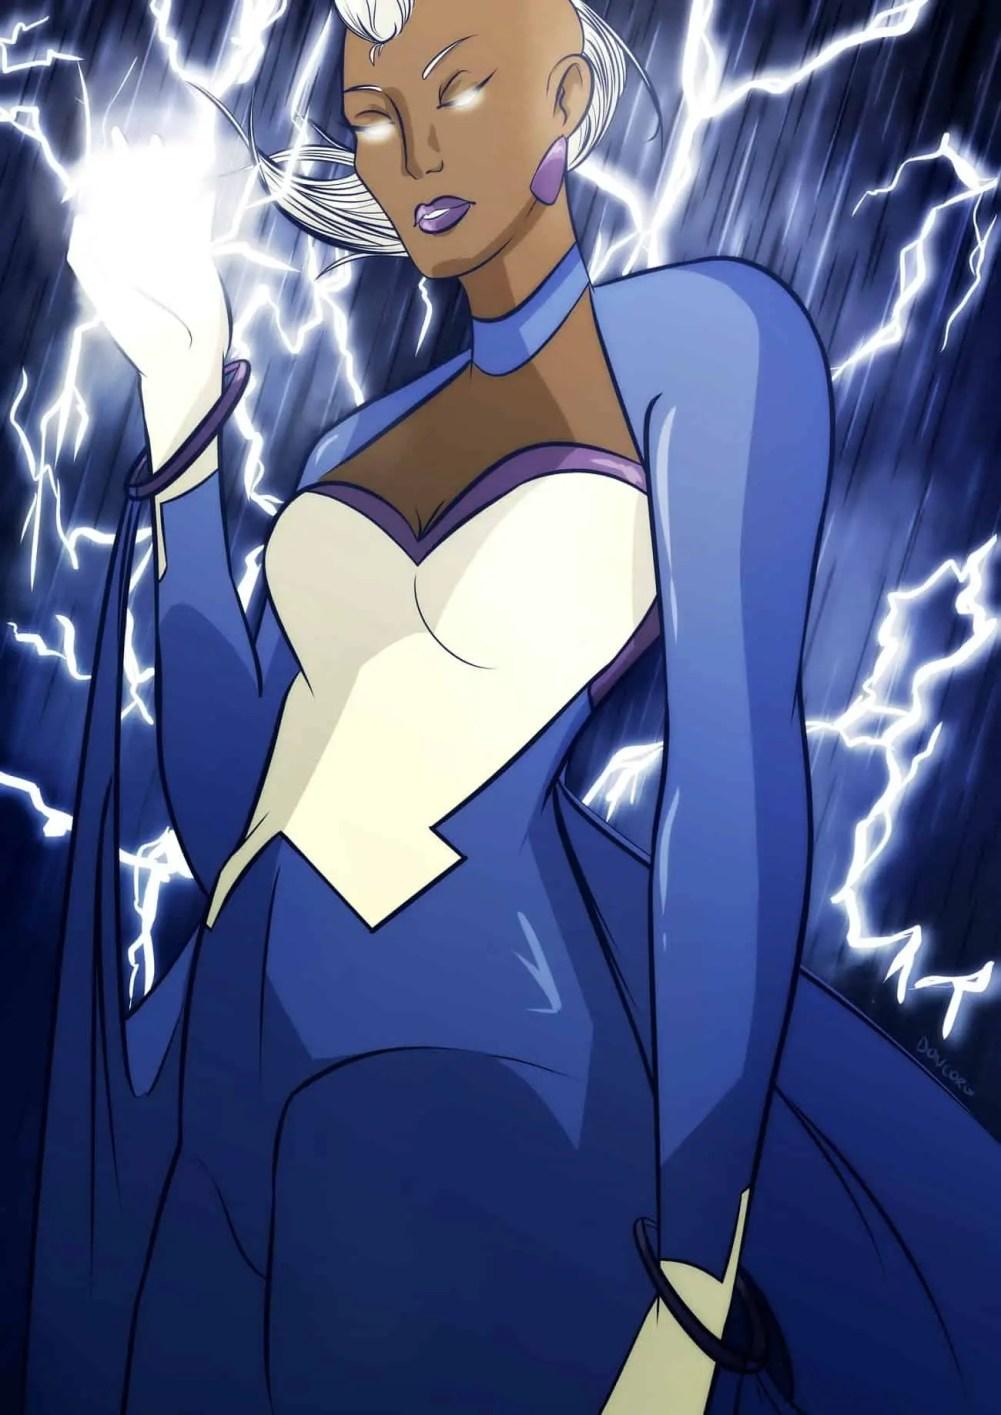 storm xmen, fanart, fan art, digital painting, marvel comics, illustration, wild, badass